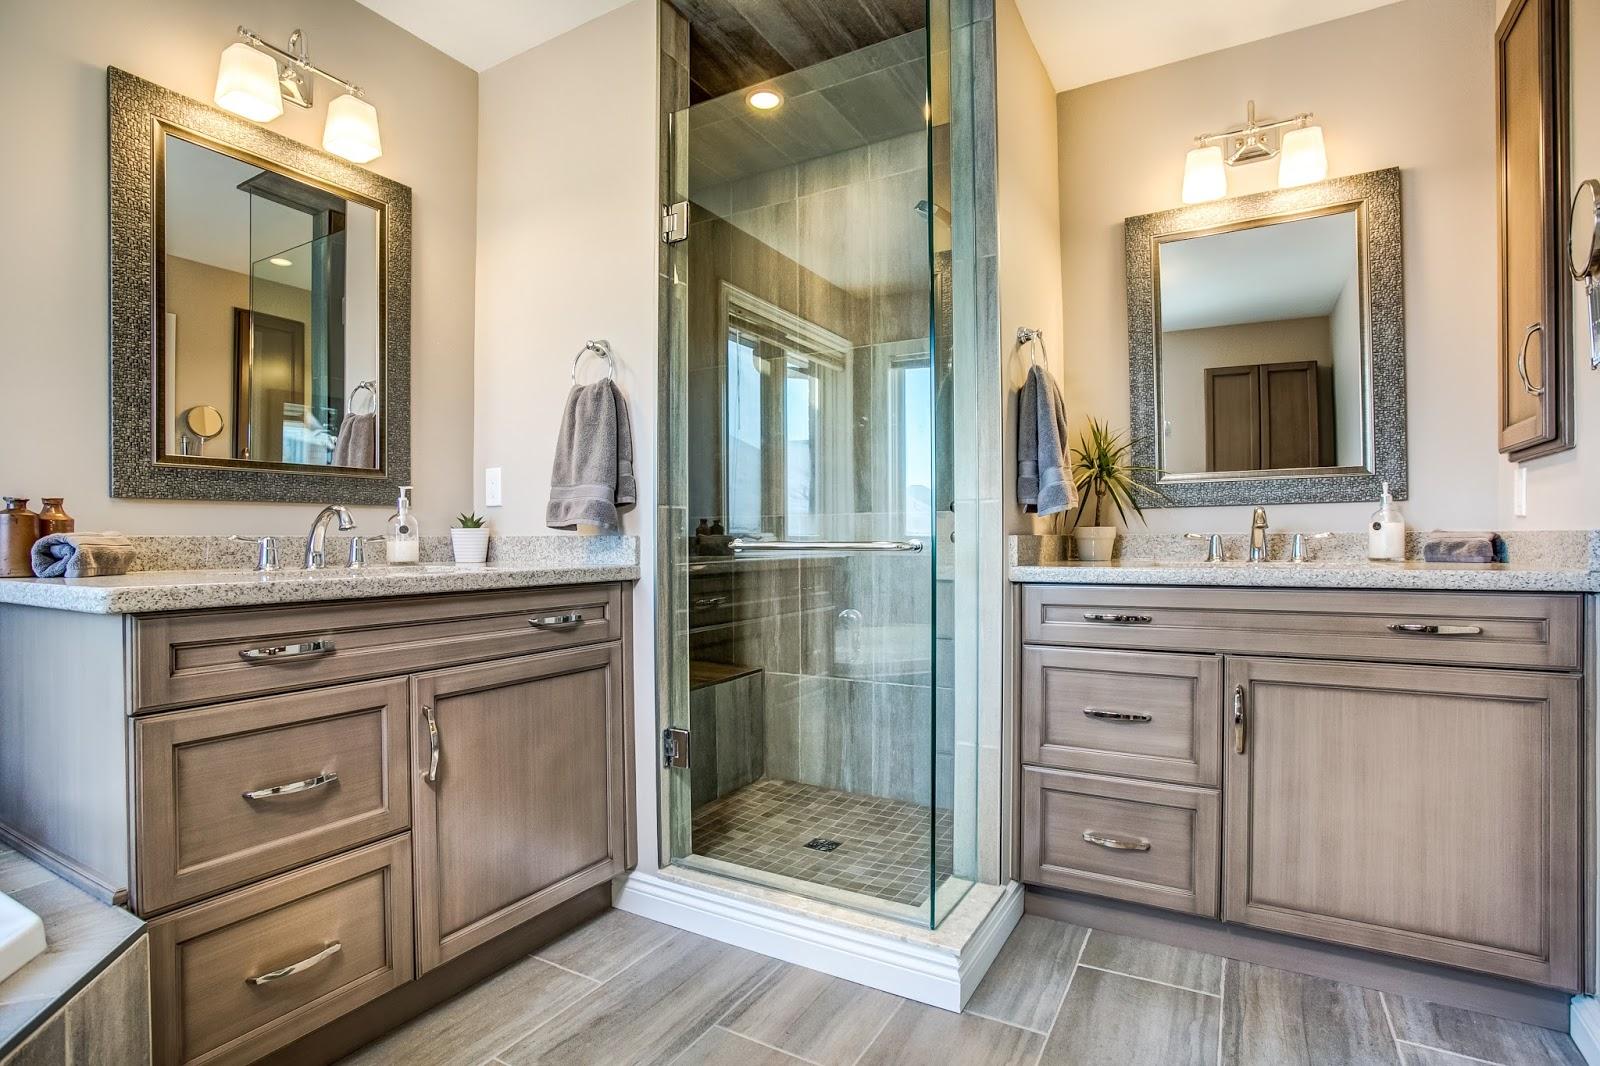 Bathroom Remodel Cost in 2020: Budget, Average, & Luxury ... on Restroom Renovation  id=62082